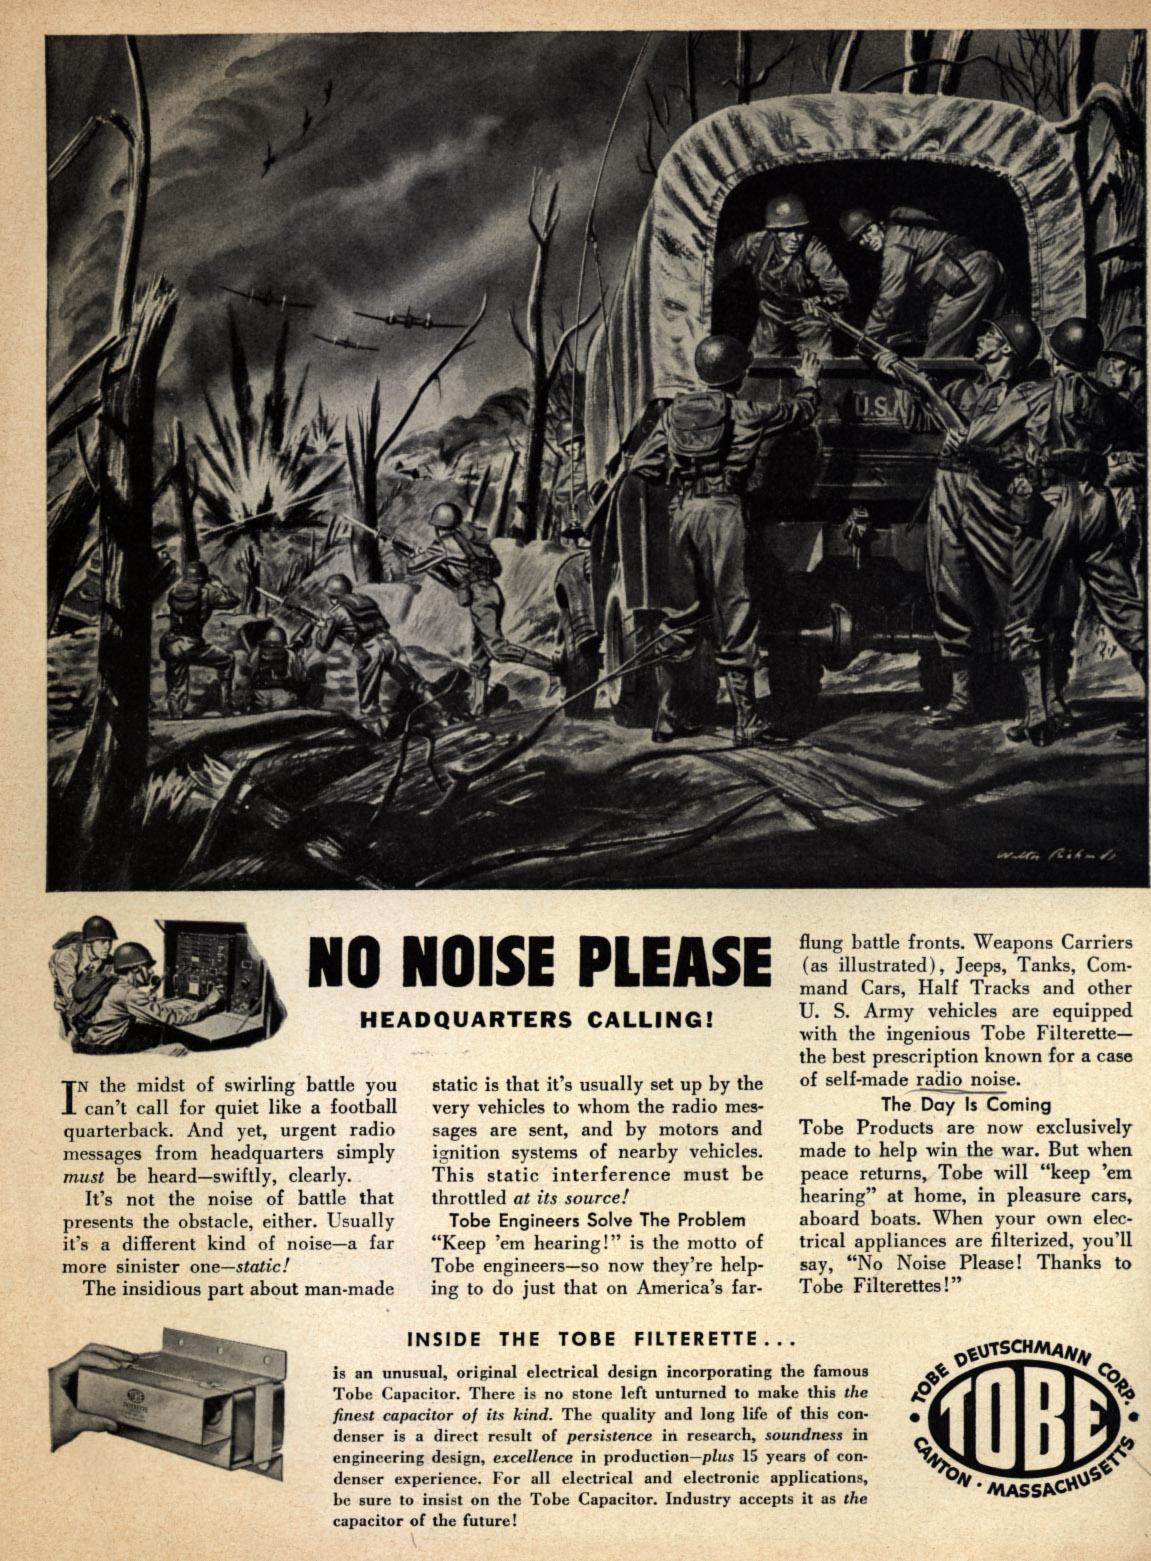 No_Noise_Please._Headquarters_Calling